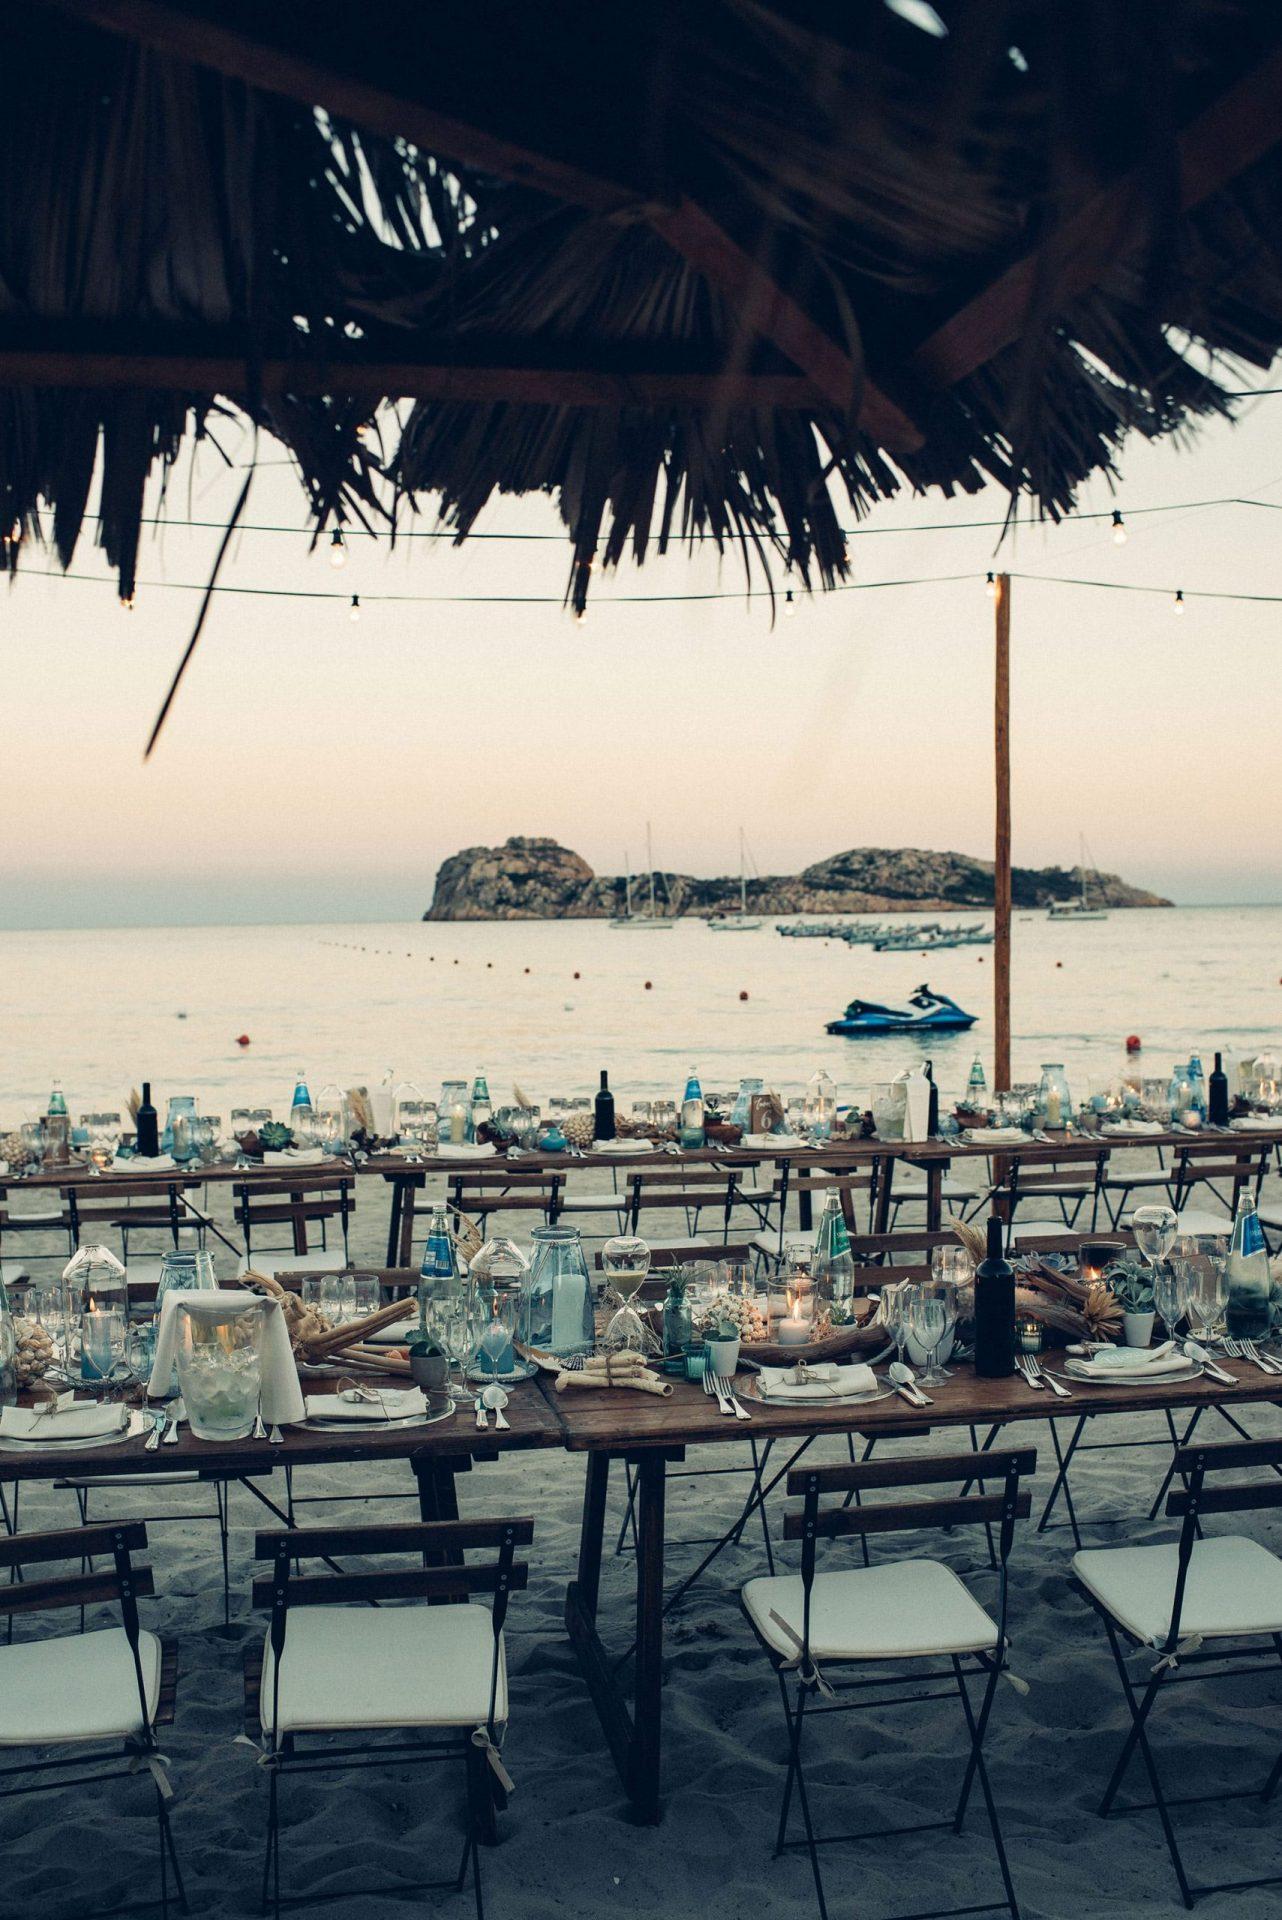 Mario and Mery, beach wedding long table